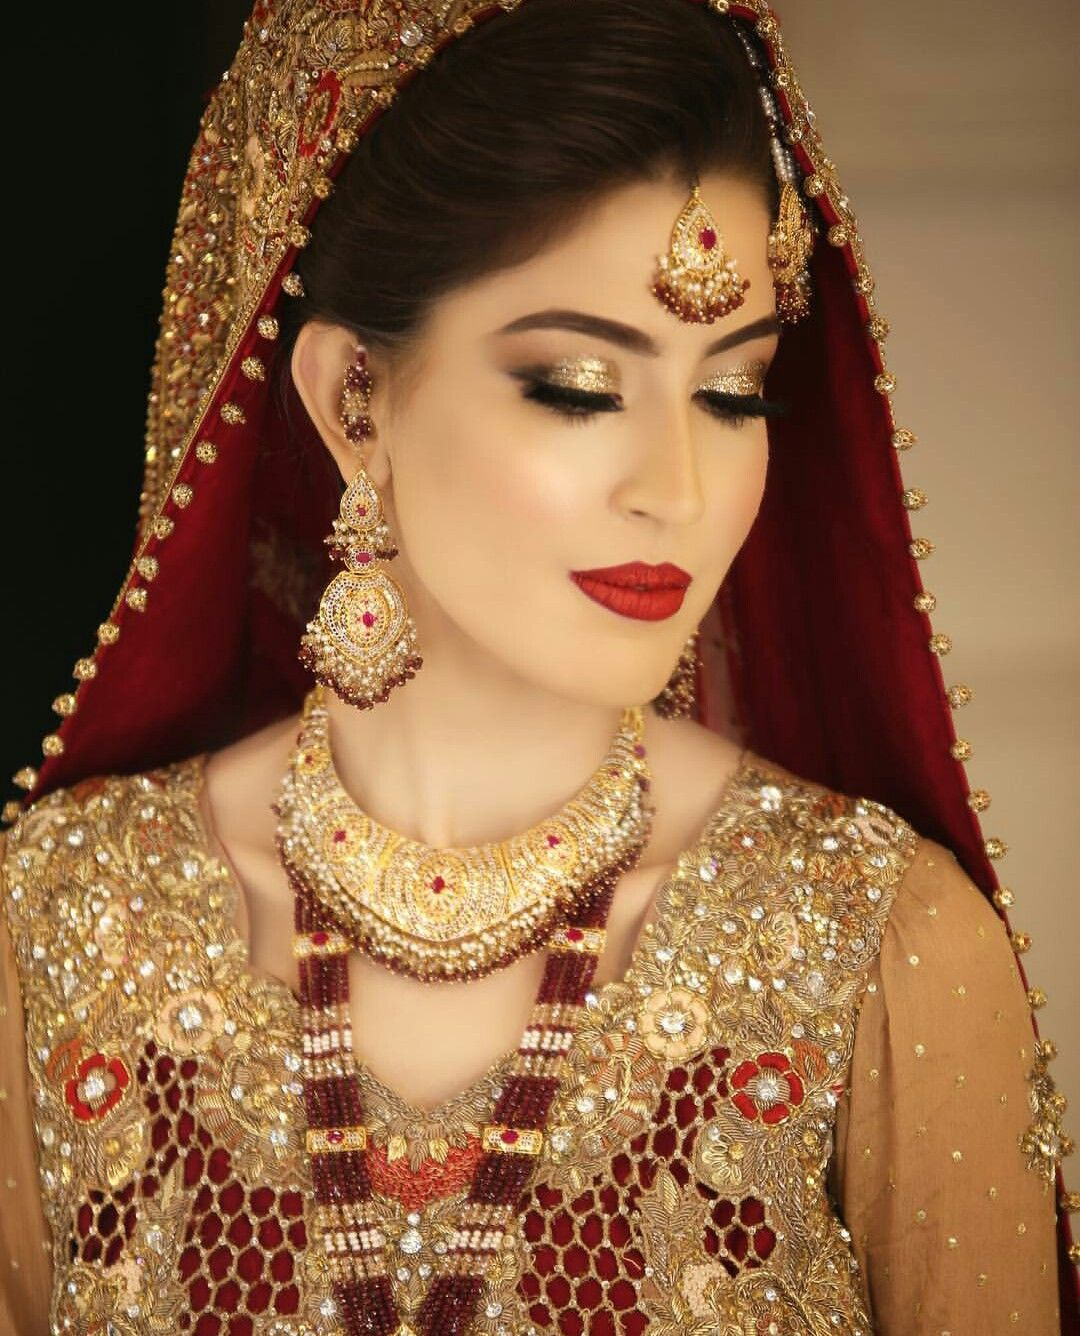 Pin by samina ejaz on bridal fashion pakistan pinterest indian